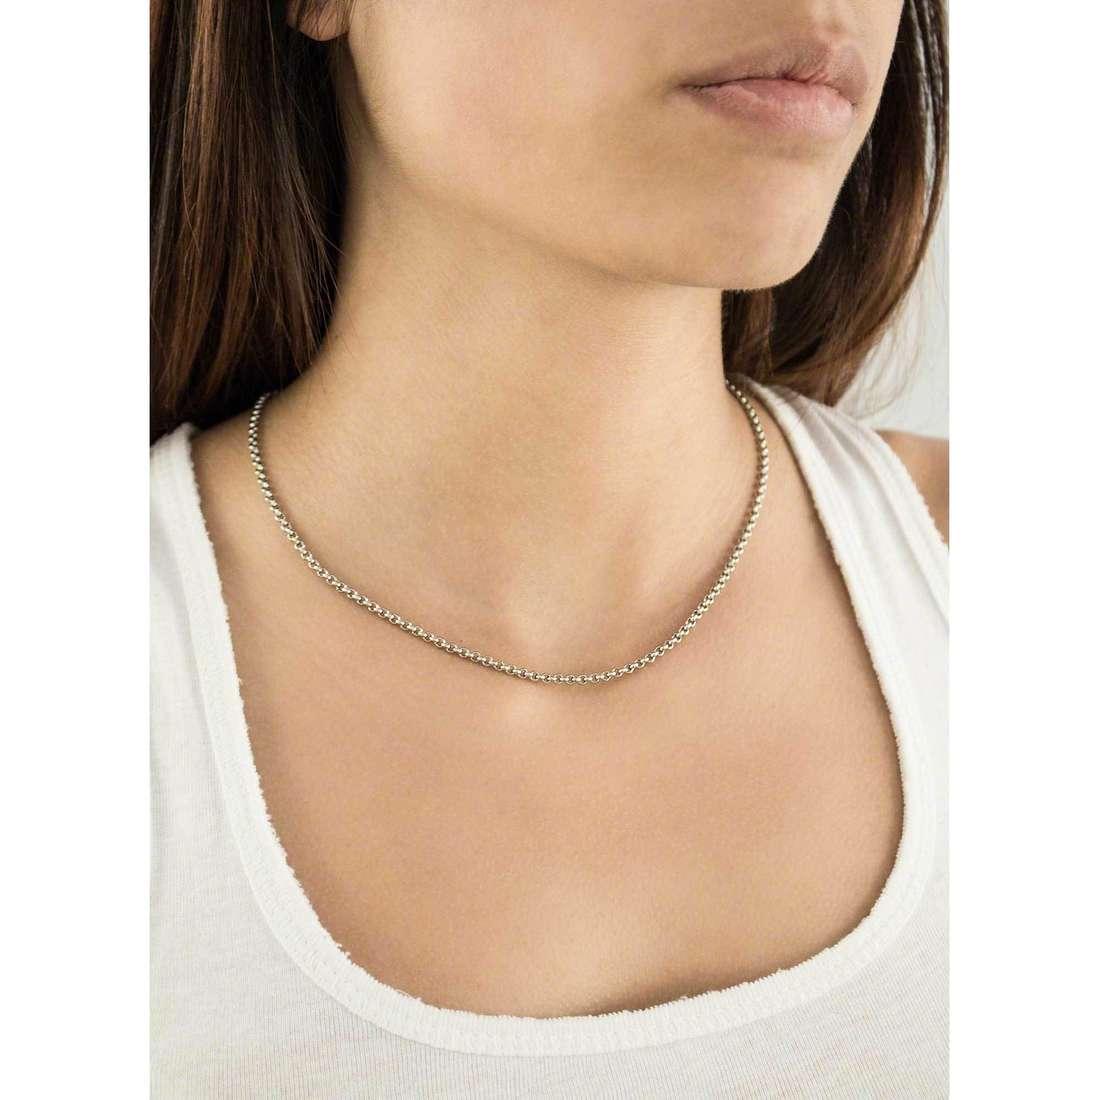 Morellato necklaces Drops woman SCZX3 indosso